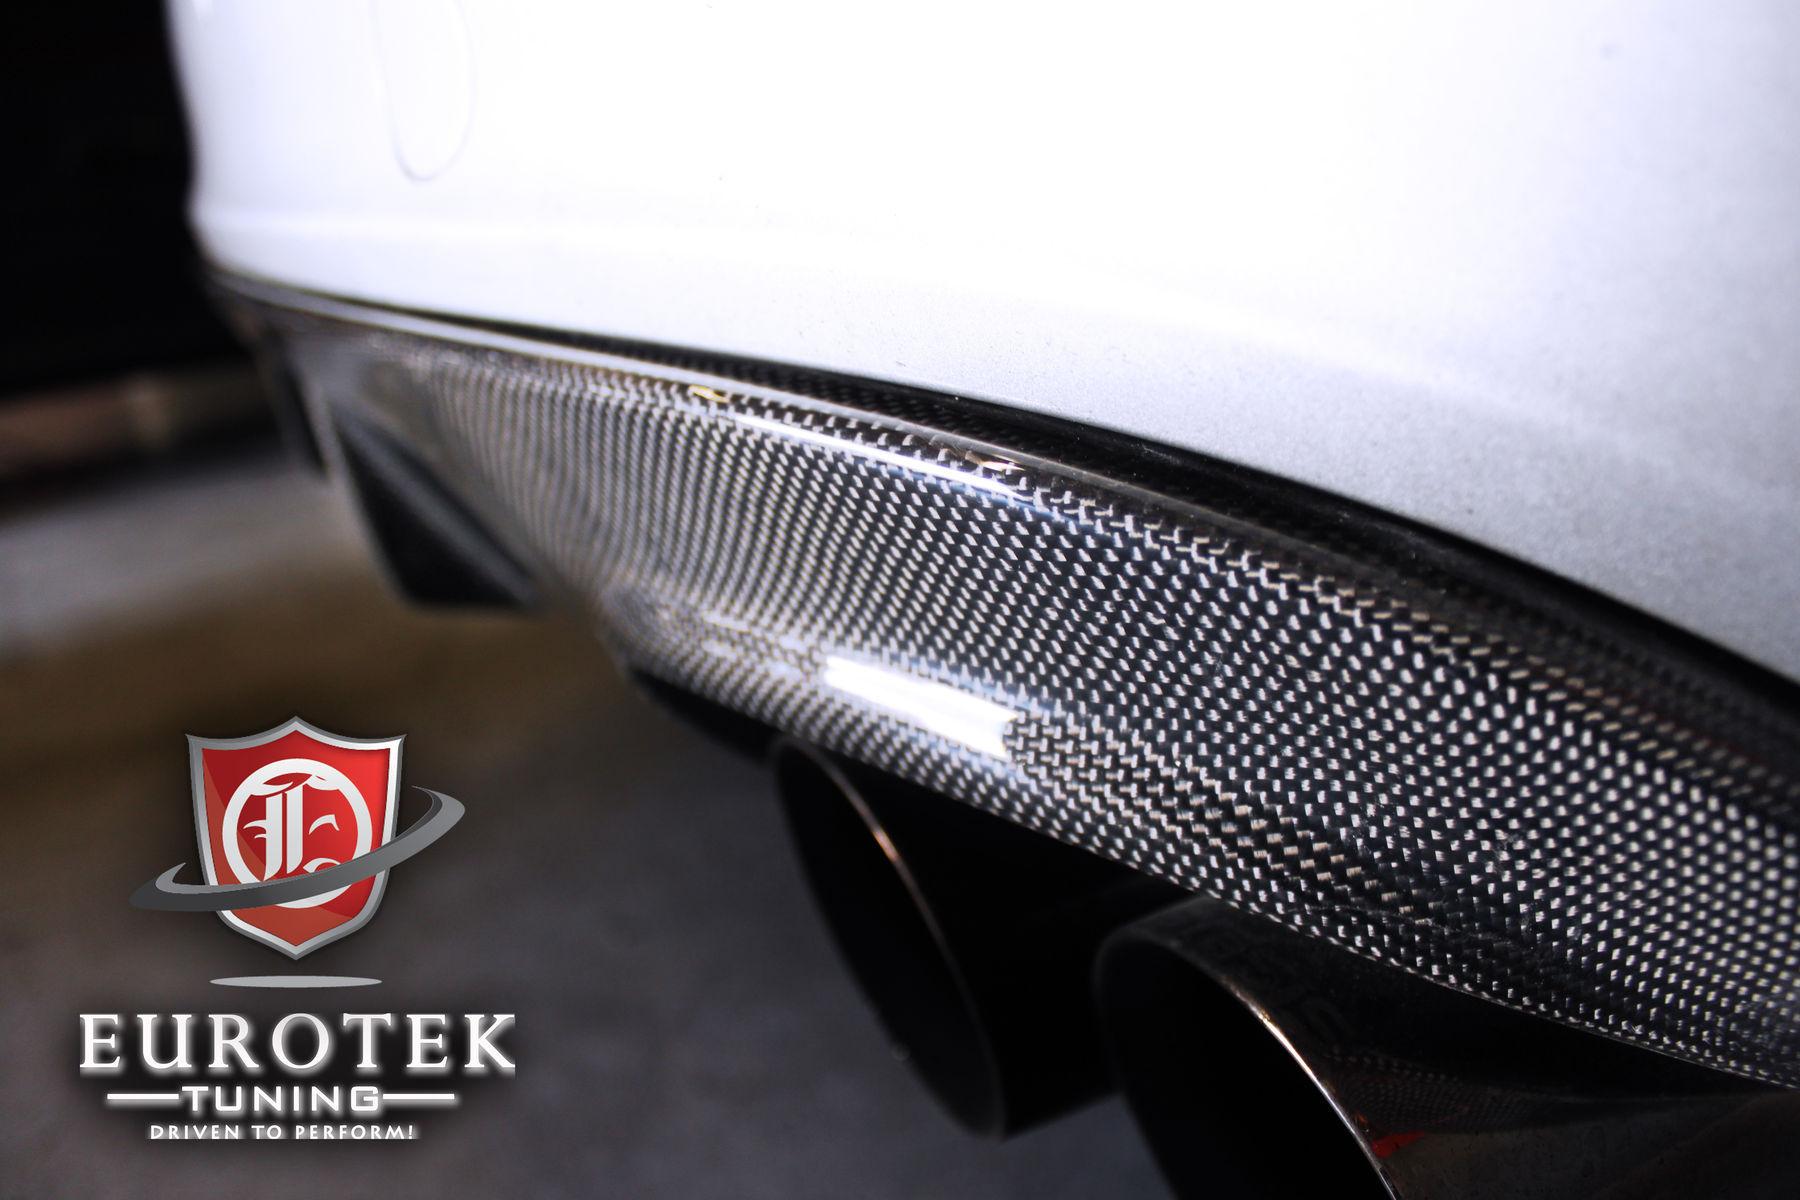 2011 Audi S4 | EuroGEAR Audi B8 S4 Rear Carbon Fiber Splitter (for rear valance)